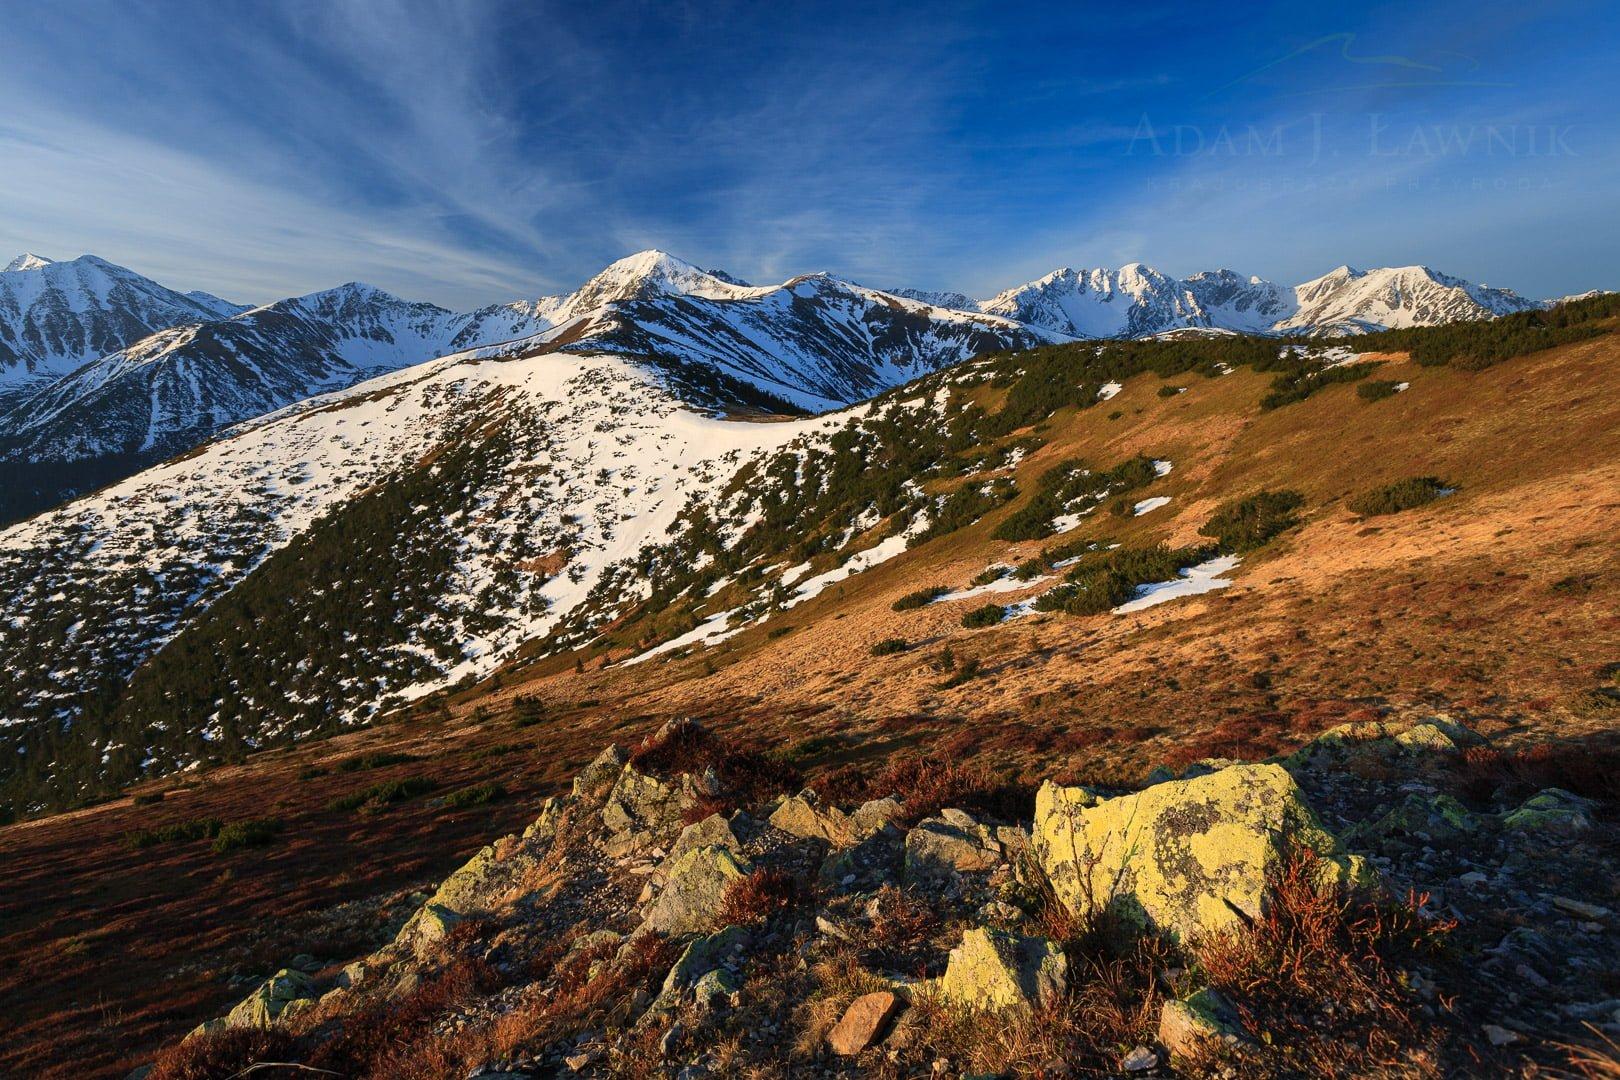 Tatra National Park, Poland 1104-00795C